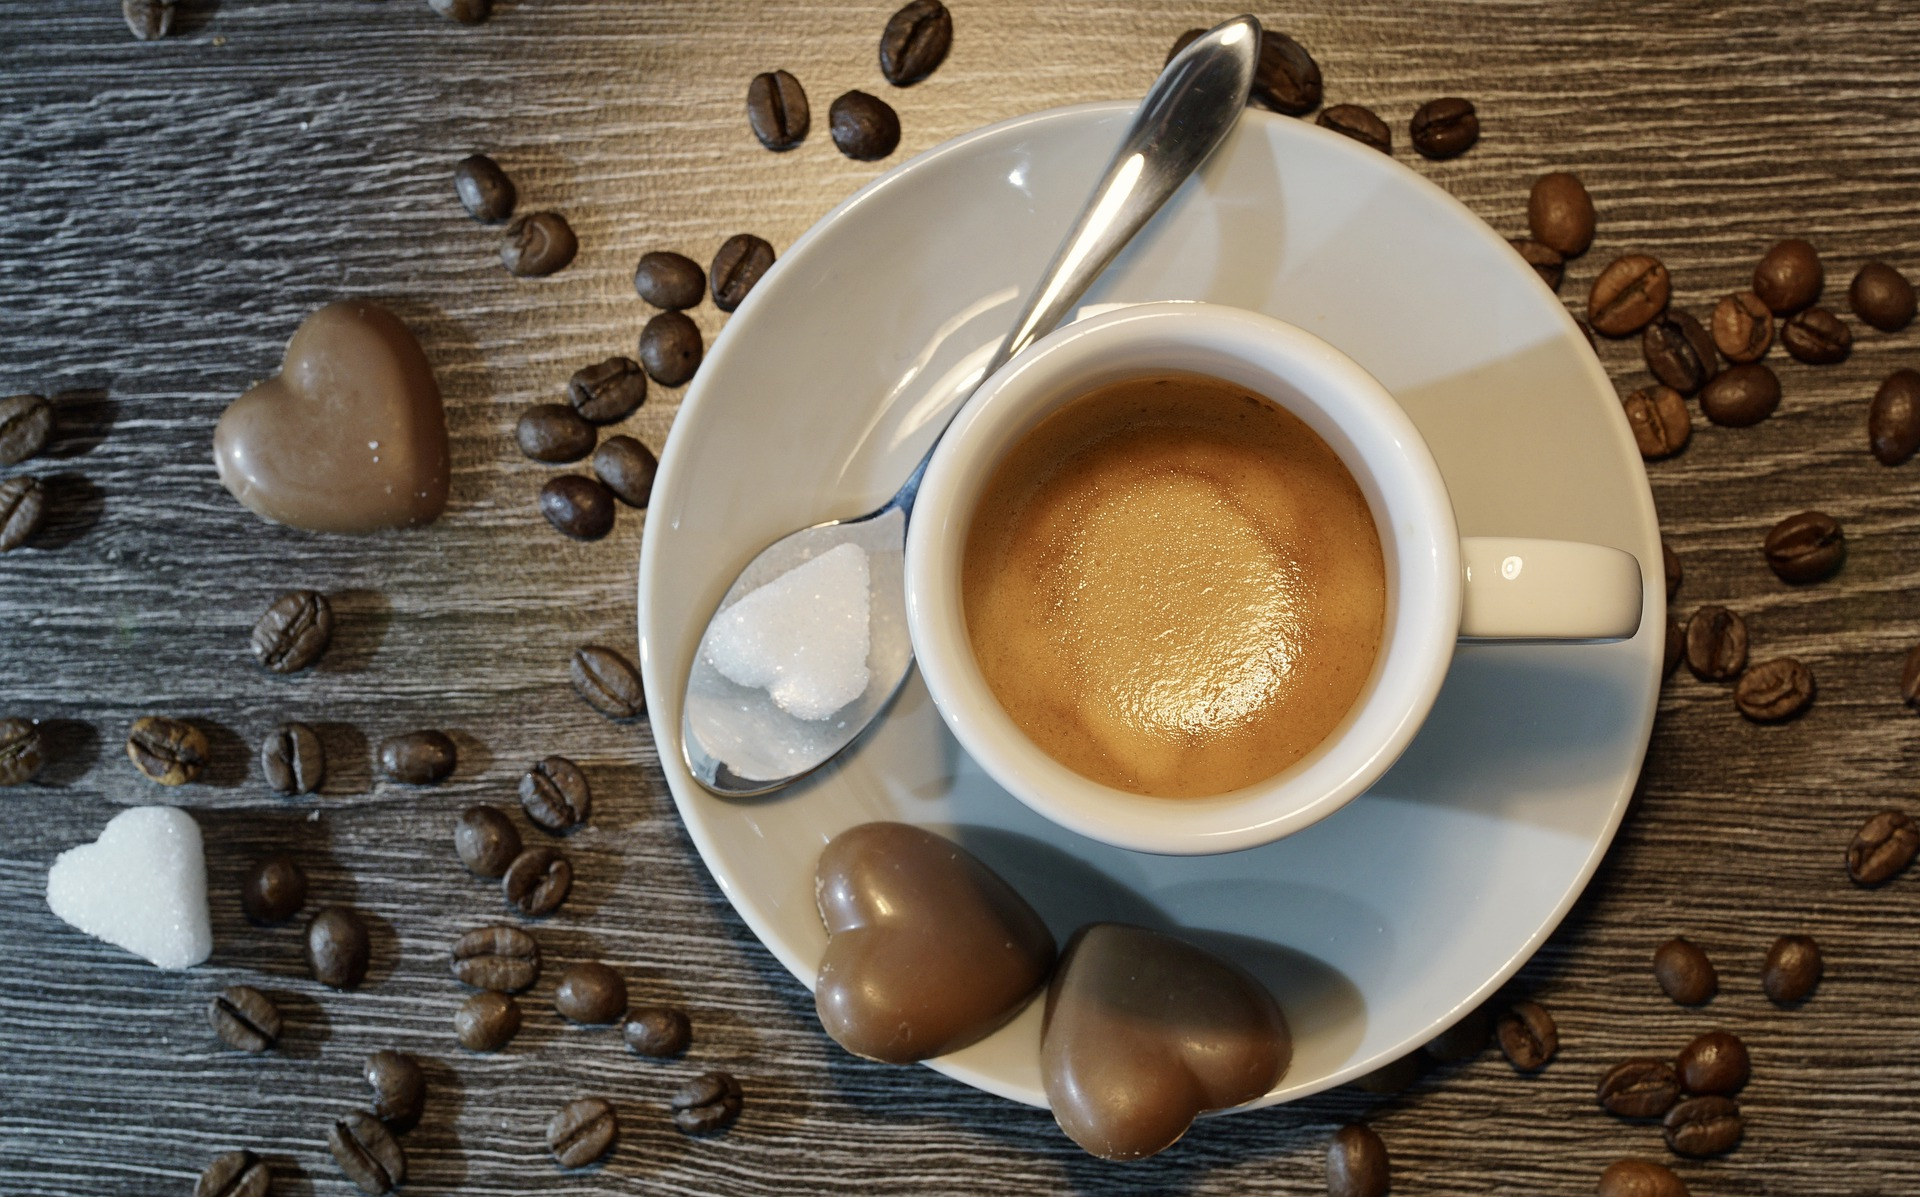 coffee-3095242_1920.jpg